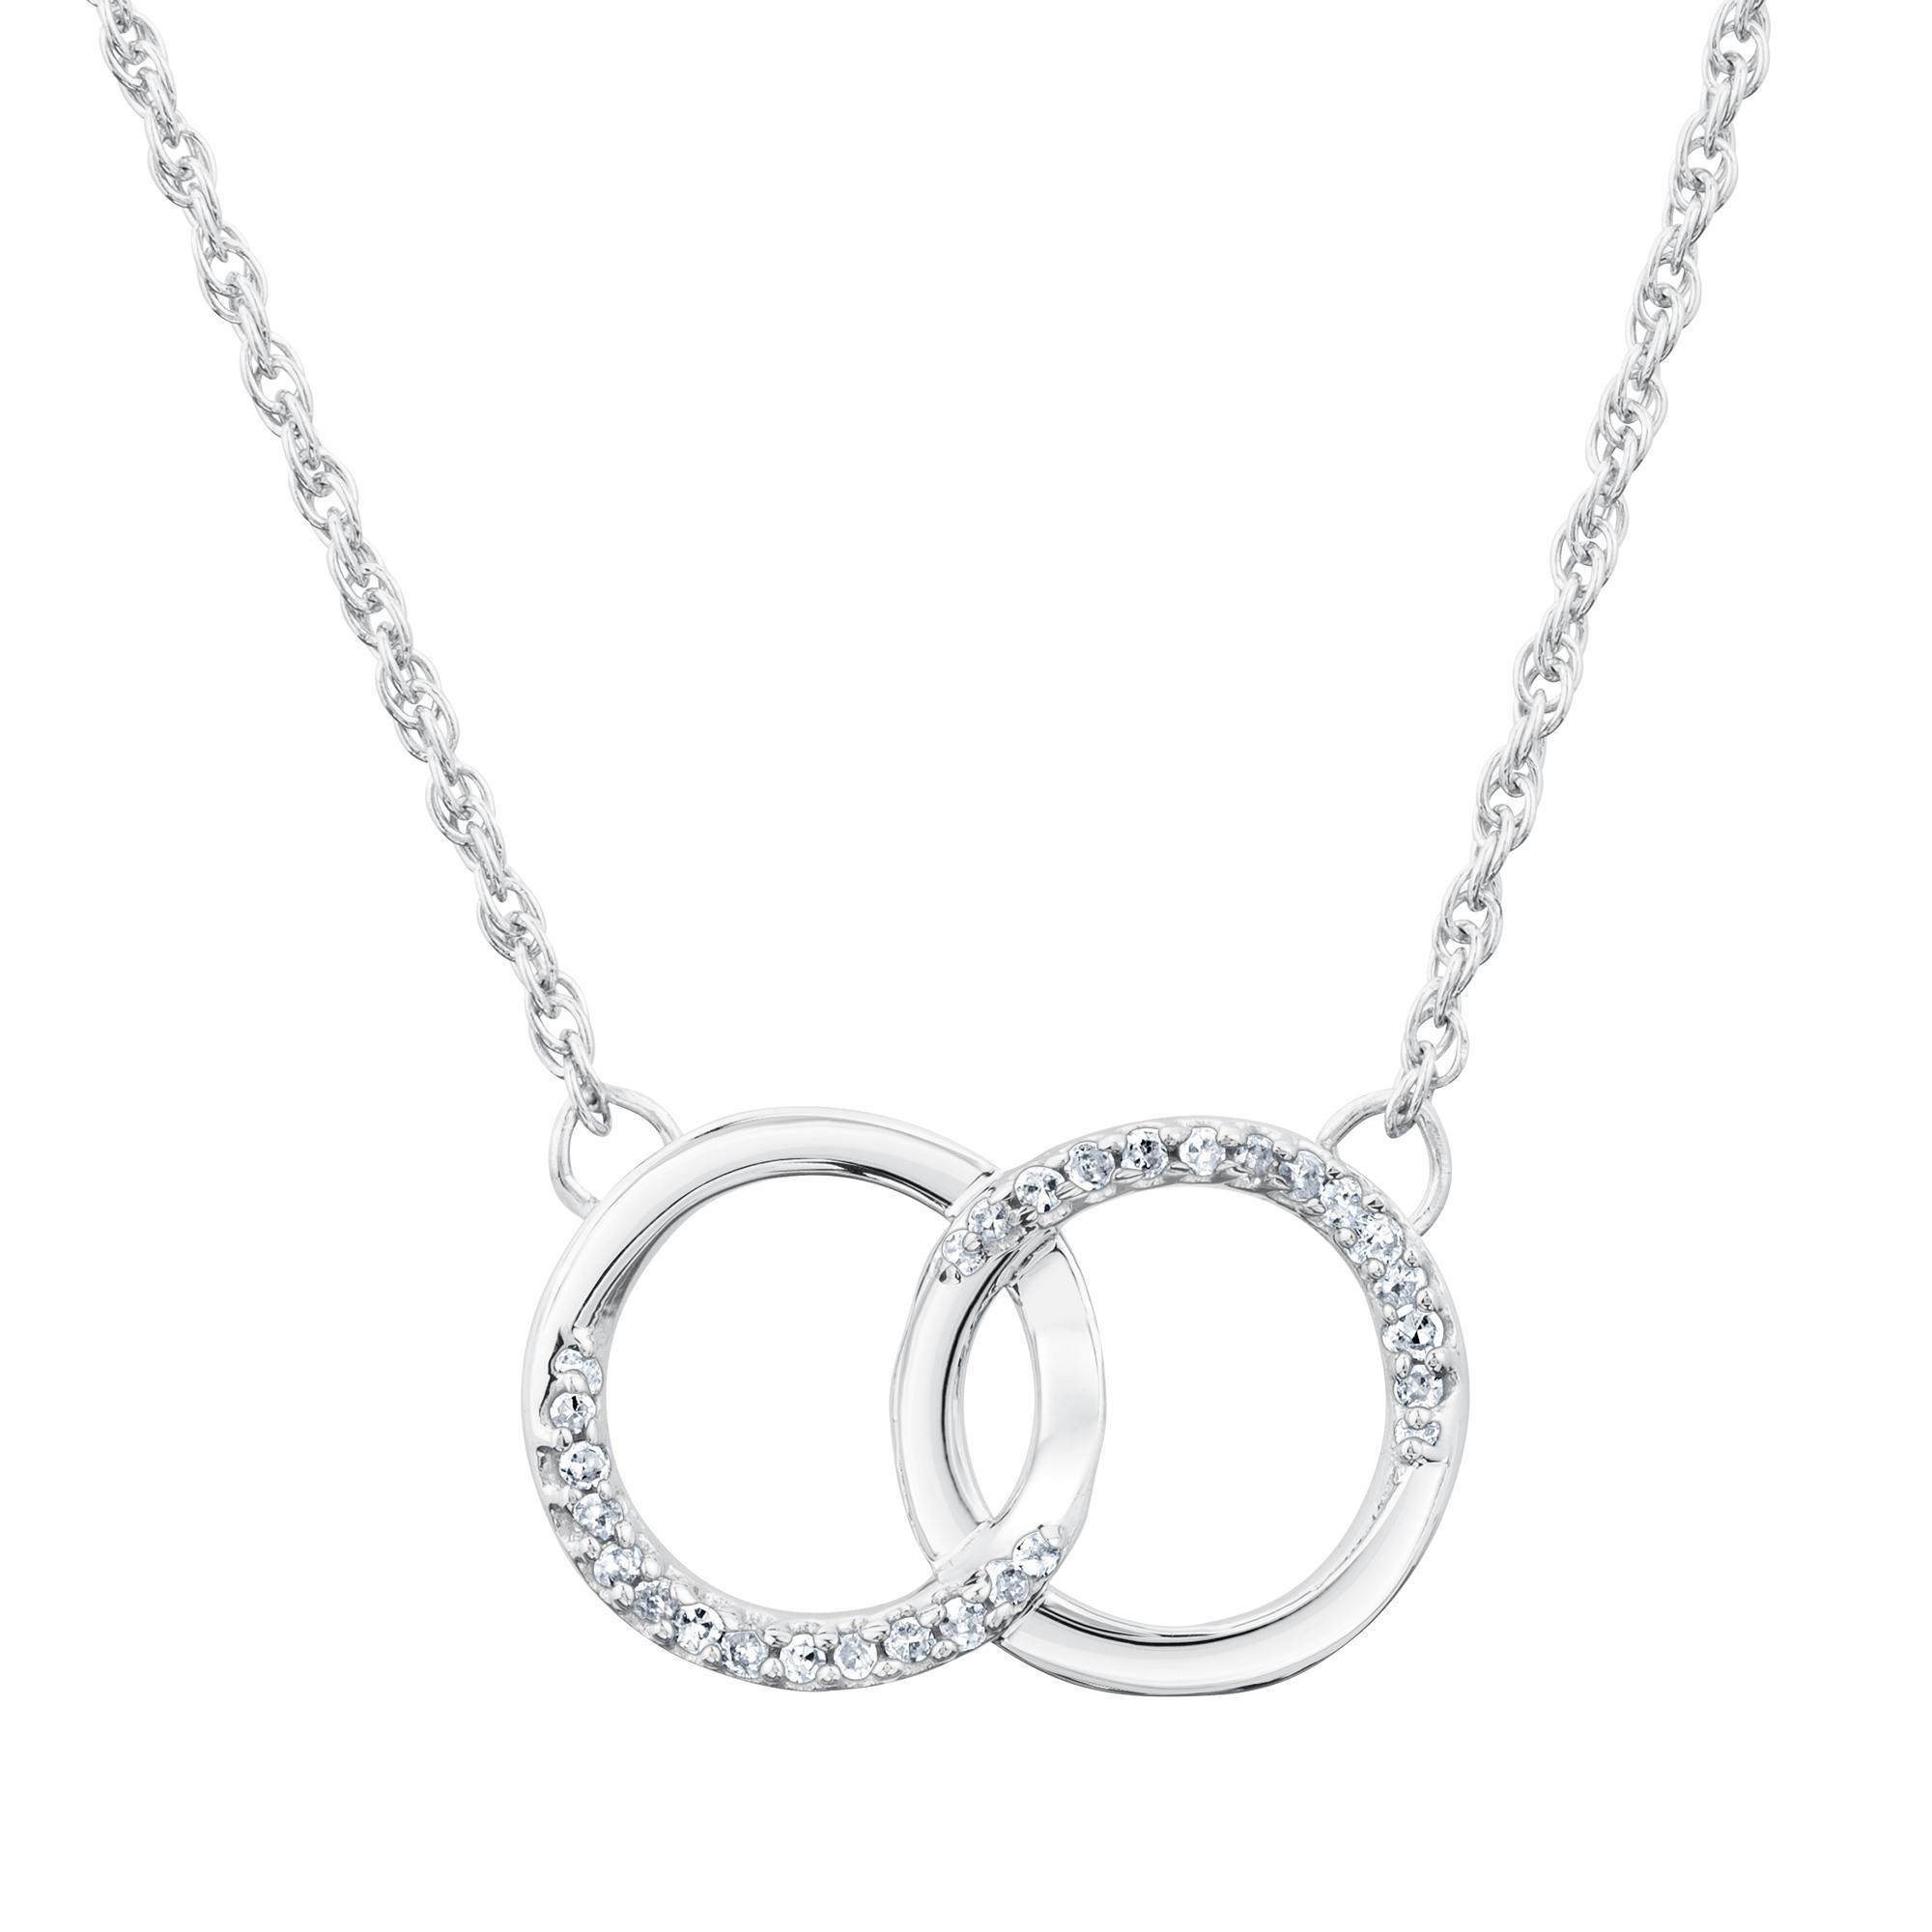 interlocking diamond circle necklace 1/10ctw - item 19430677 | reeds  jewelers avlbppv